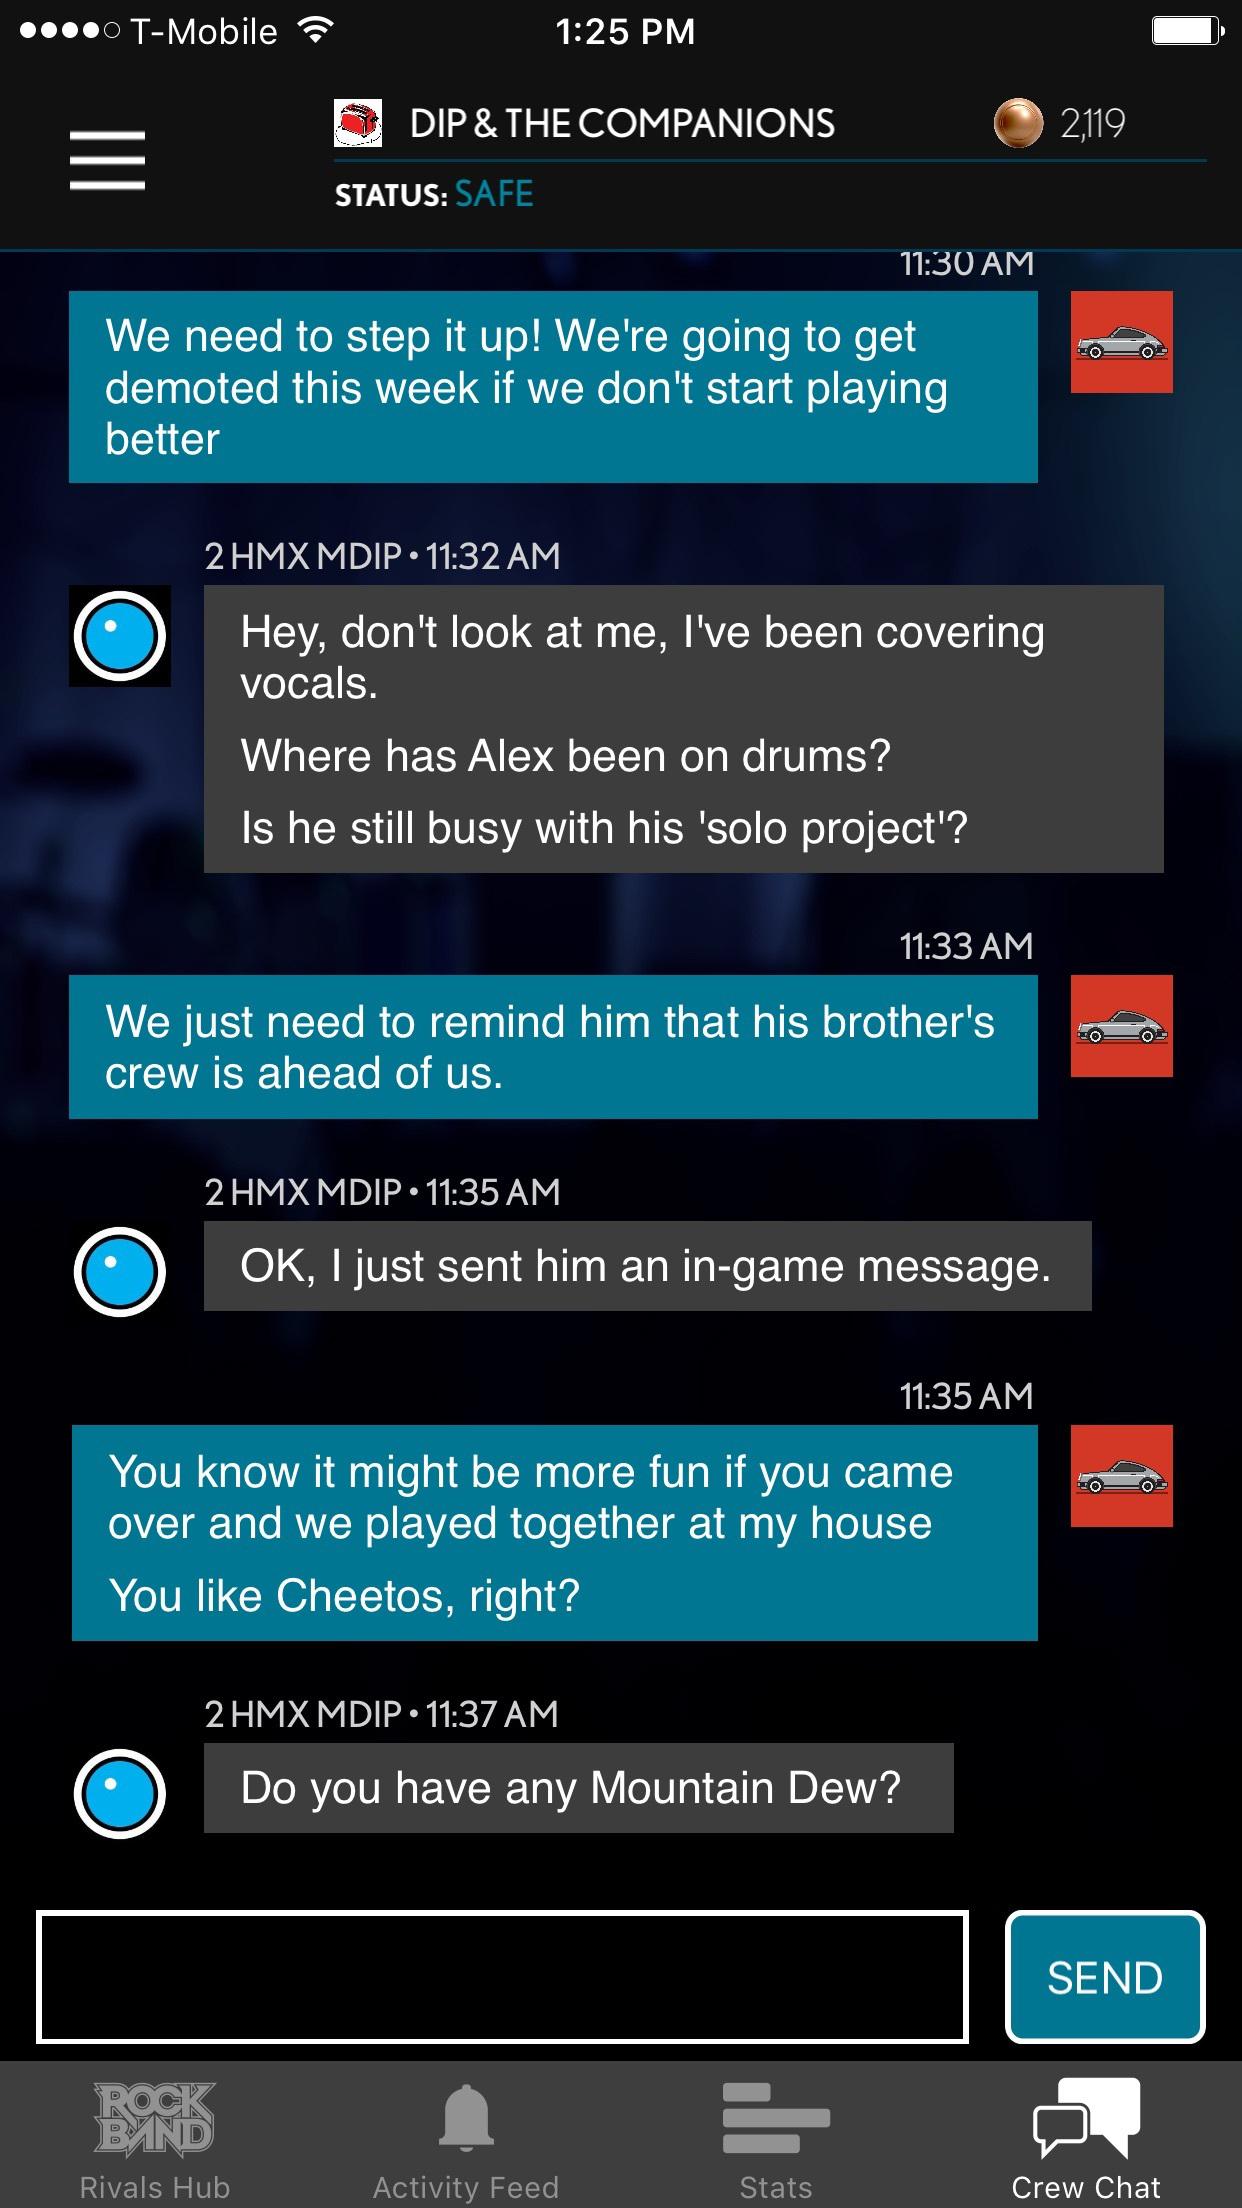 Companion App - Crew Chat